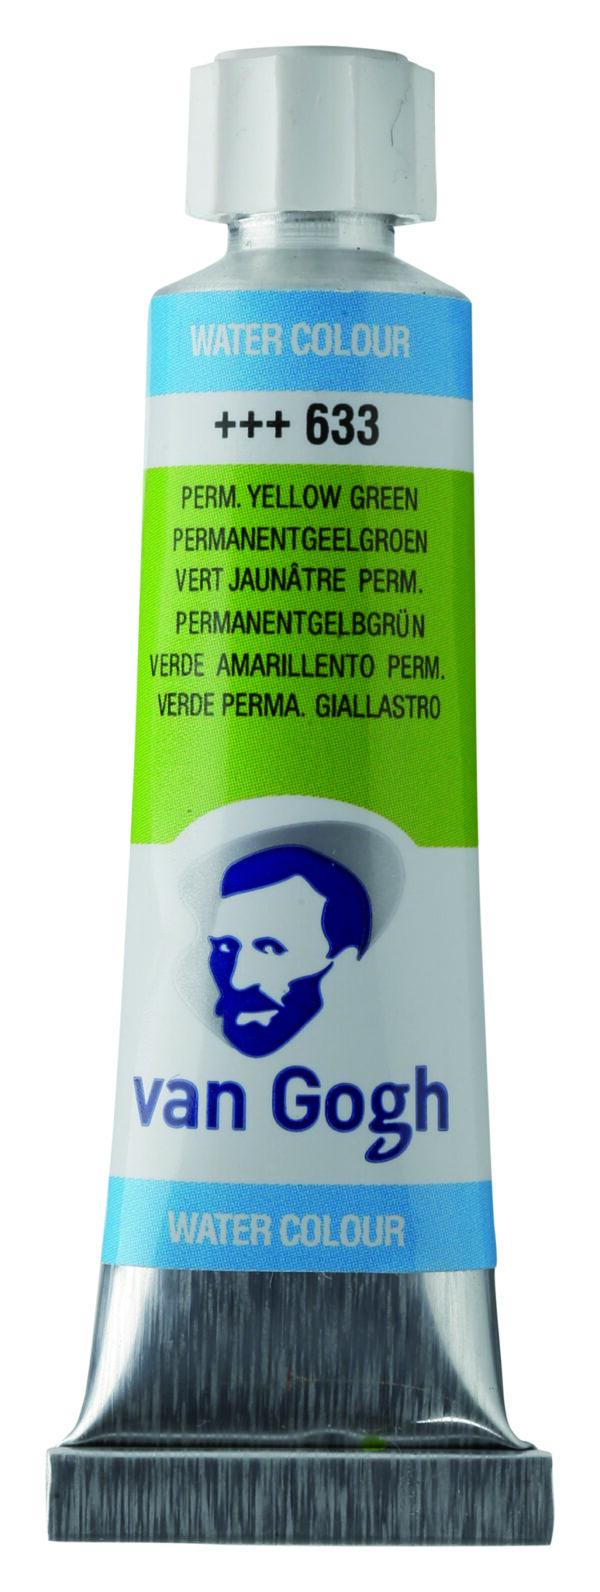 Van Gogh 633 Permanent yellowish green - 10 ml